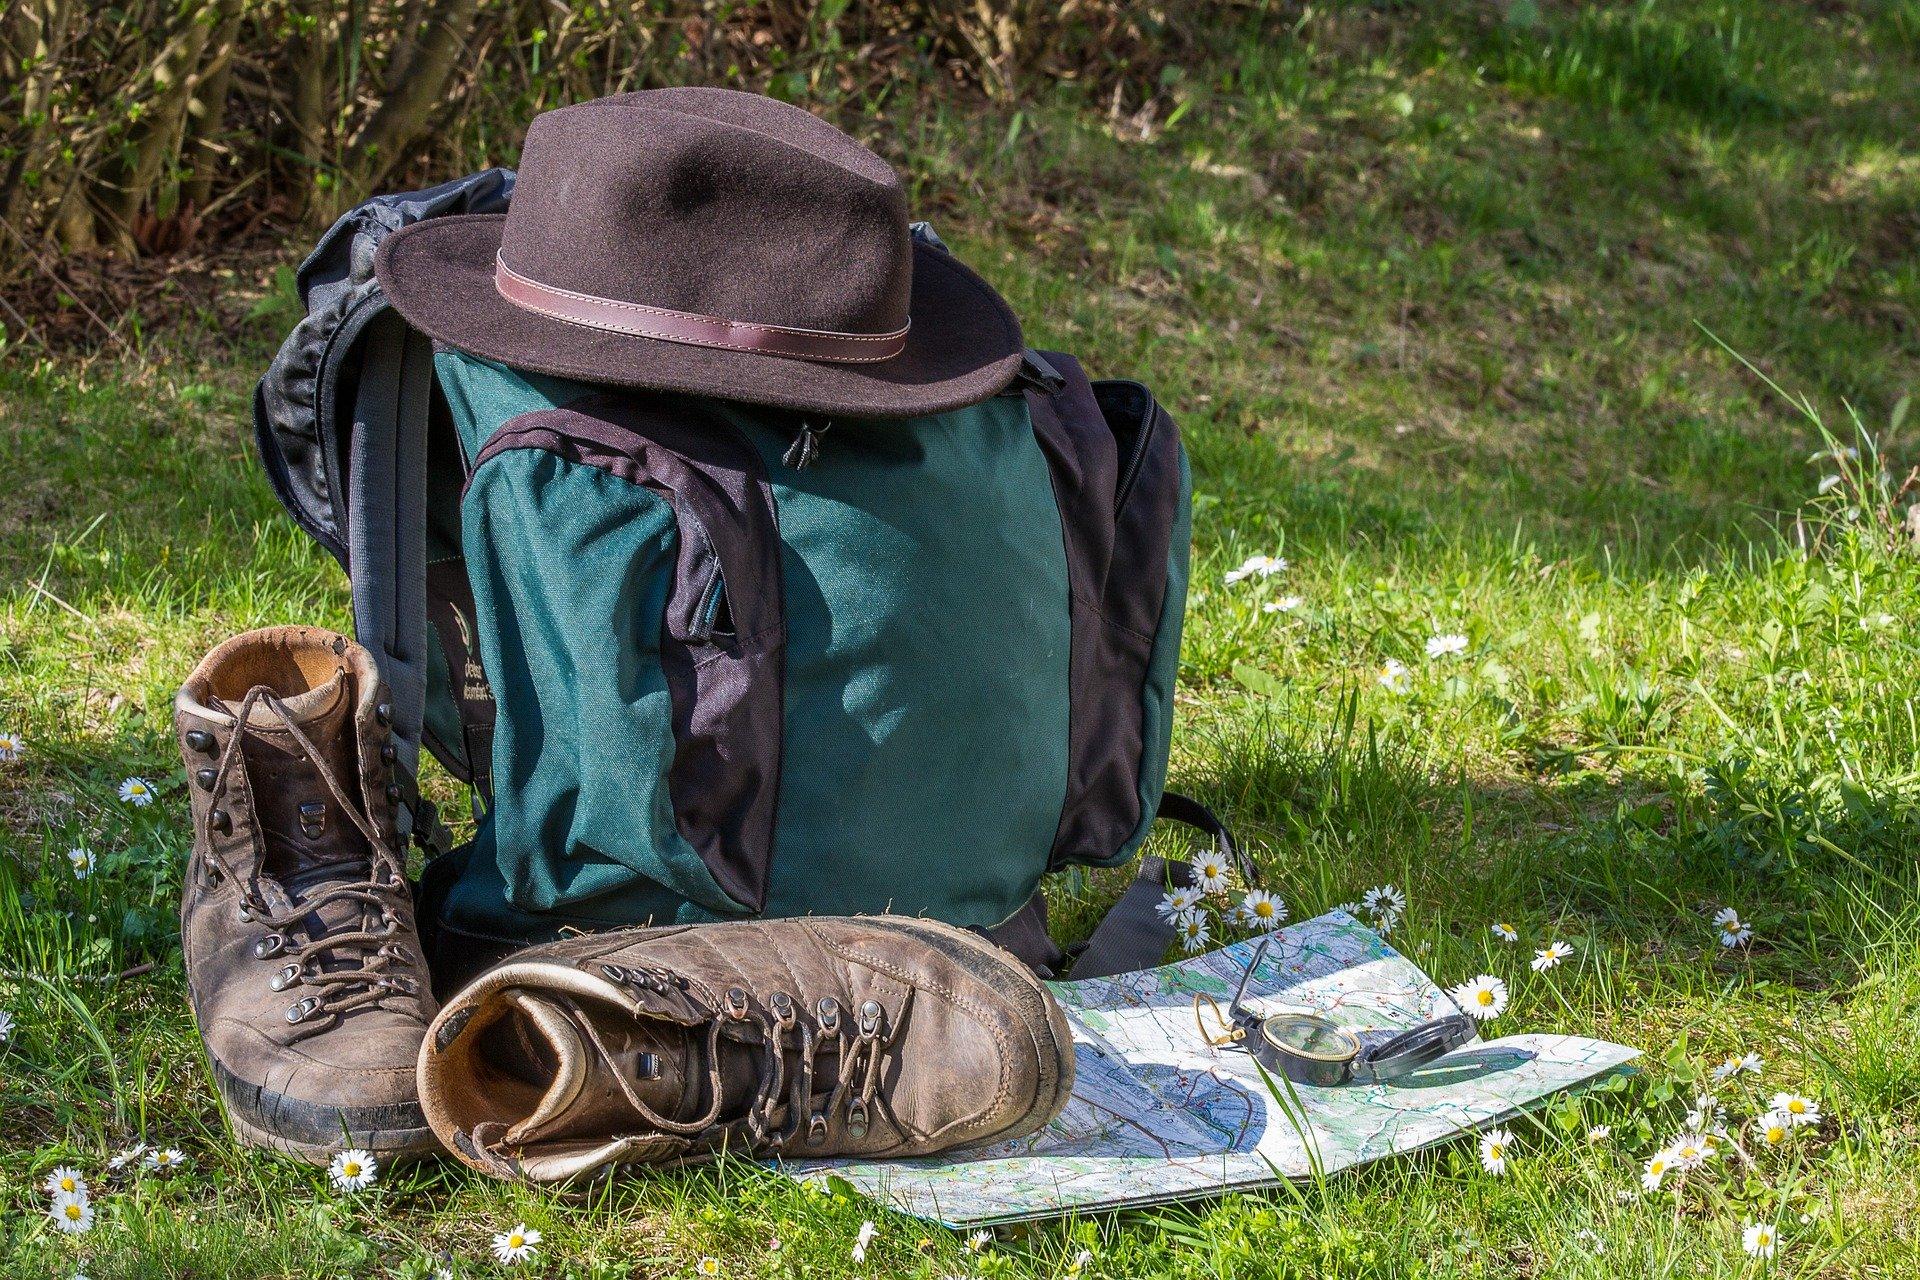 Samstagswanderungen: Über die Frankenhöhe - © pixabay